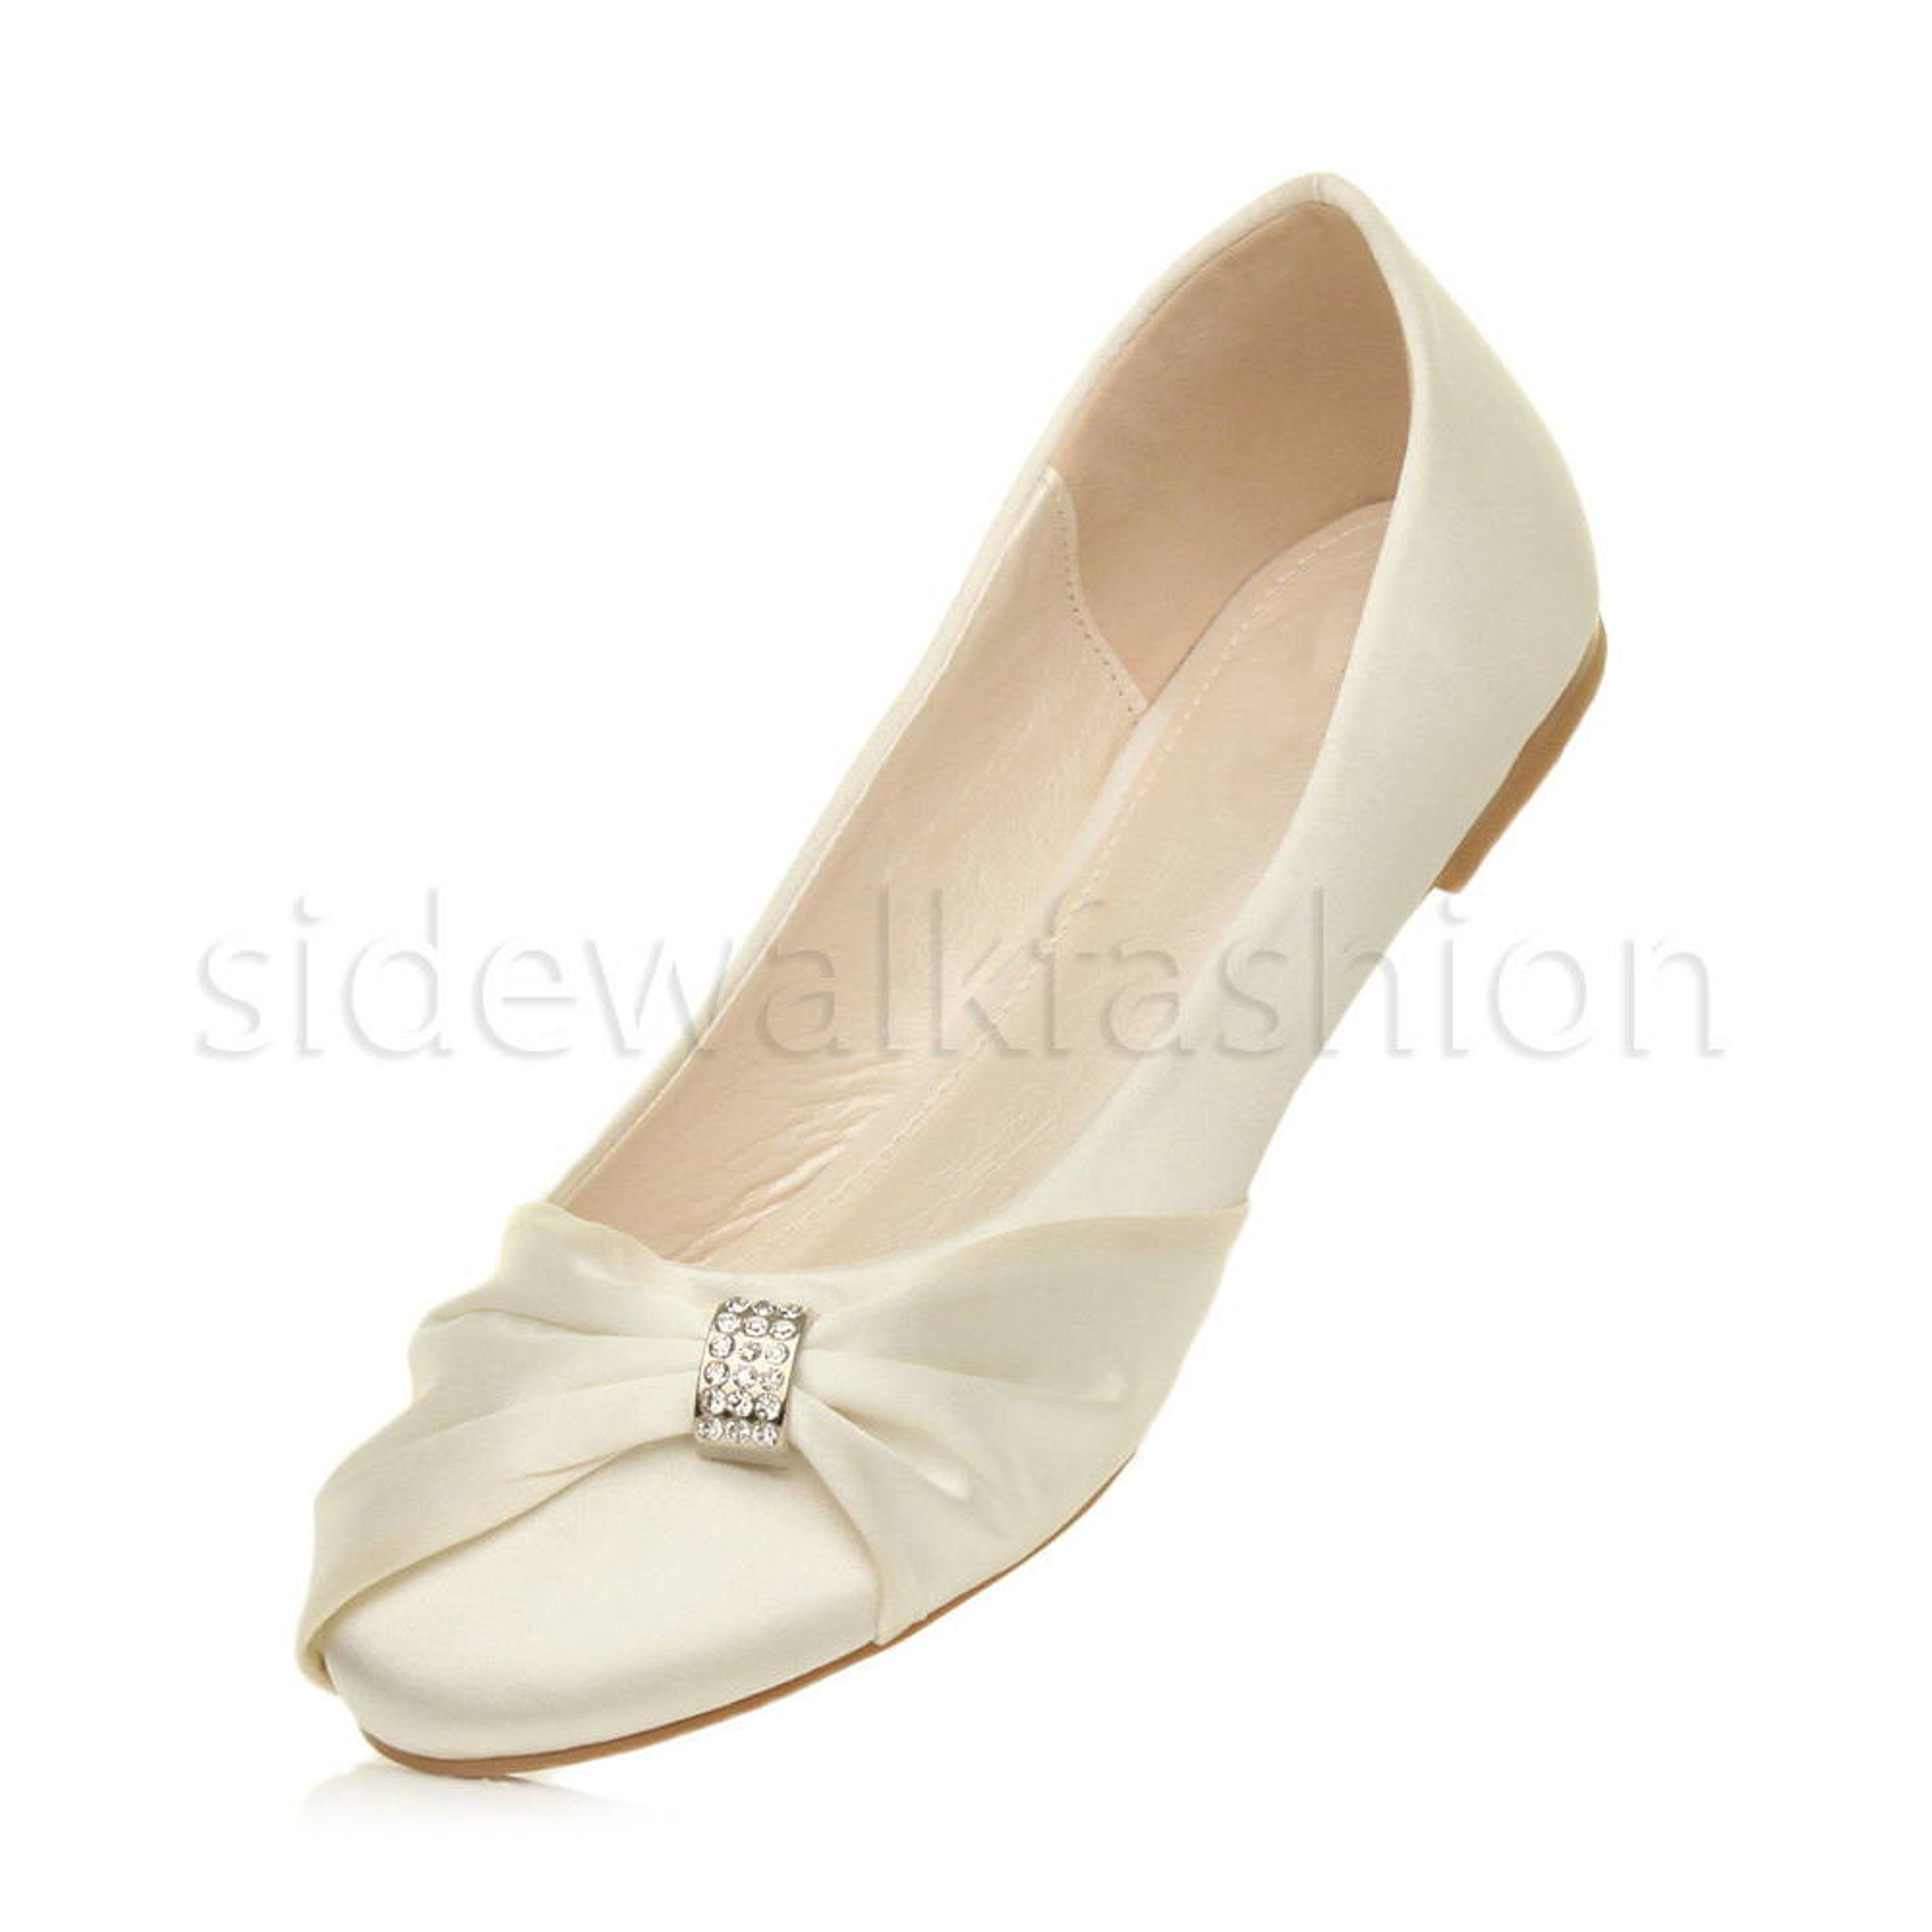 Womens-ladies-flat-wedding-bridesmaid-ruched-diamante-bridal-shoes-pumps-size thumbnail 16